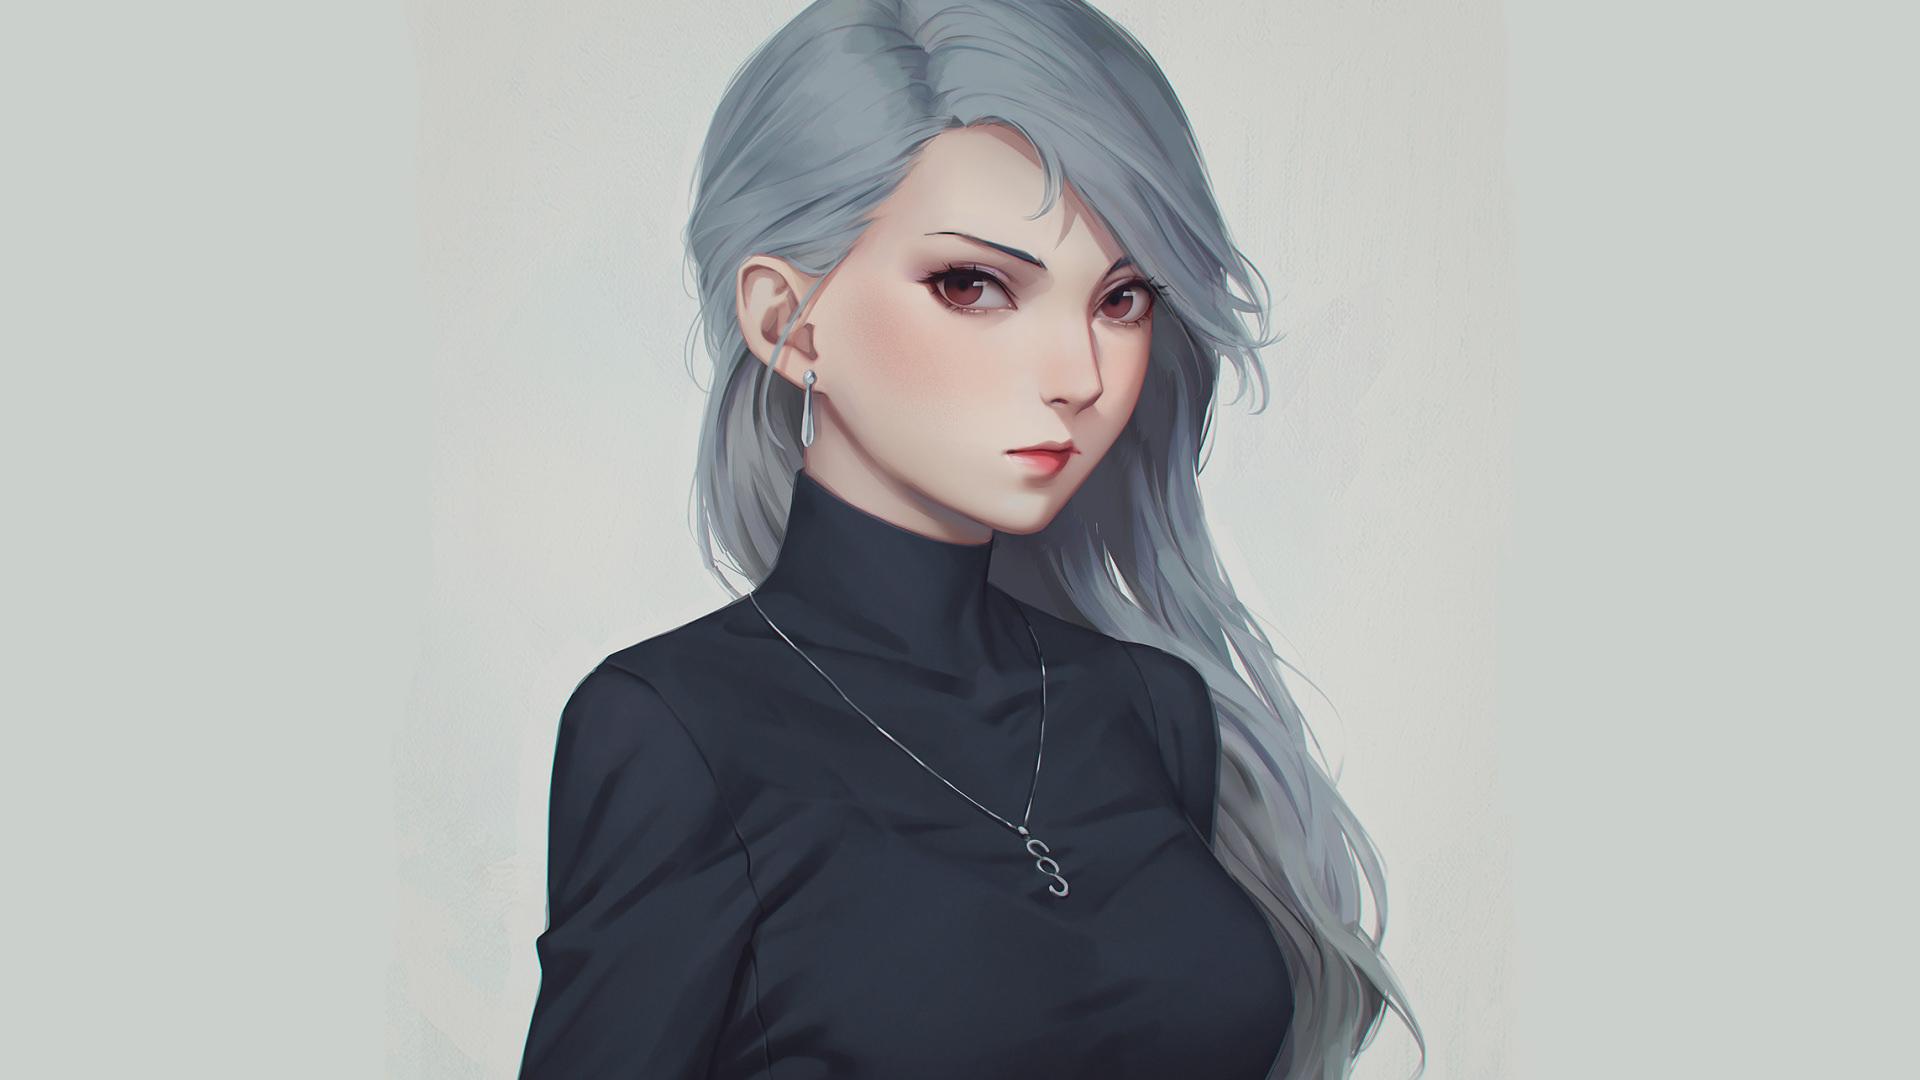 Anime 1920x1080 black clothing necklace anime girls portrait Persona 5 Persona series Sae Niijima